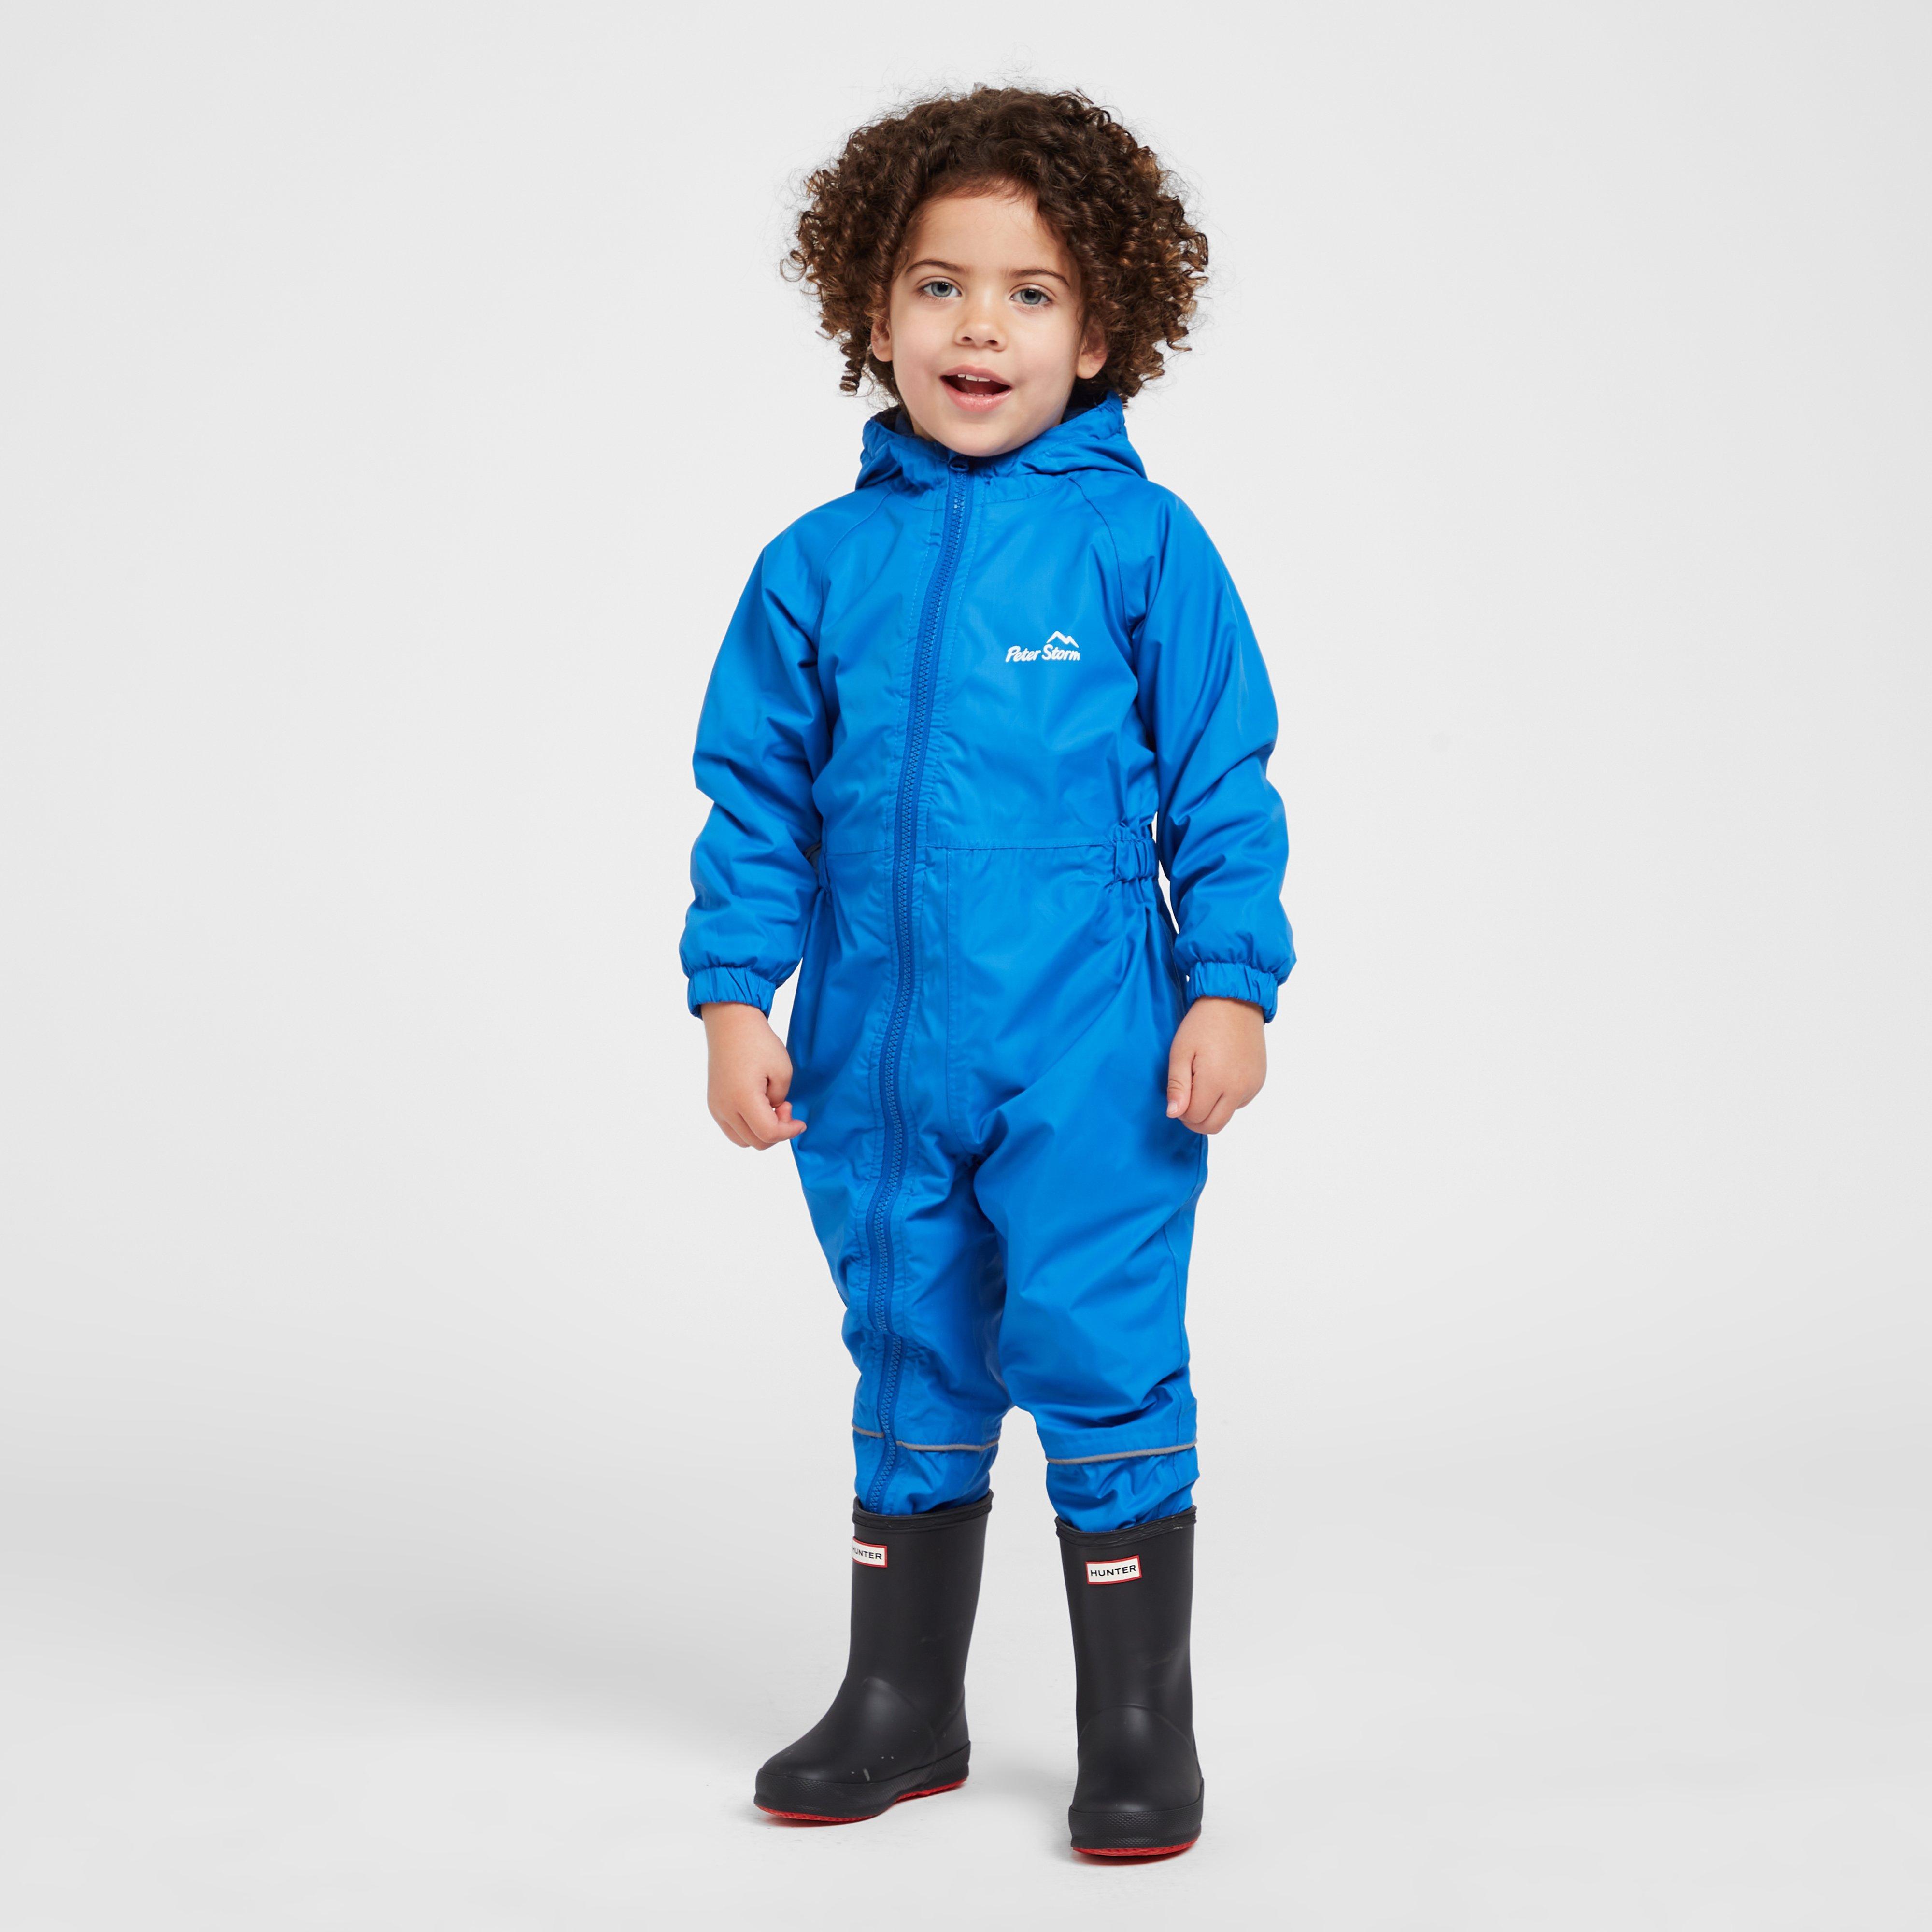 Image of Peter Storm Infants